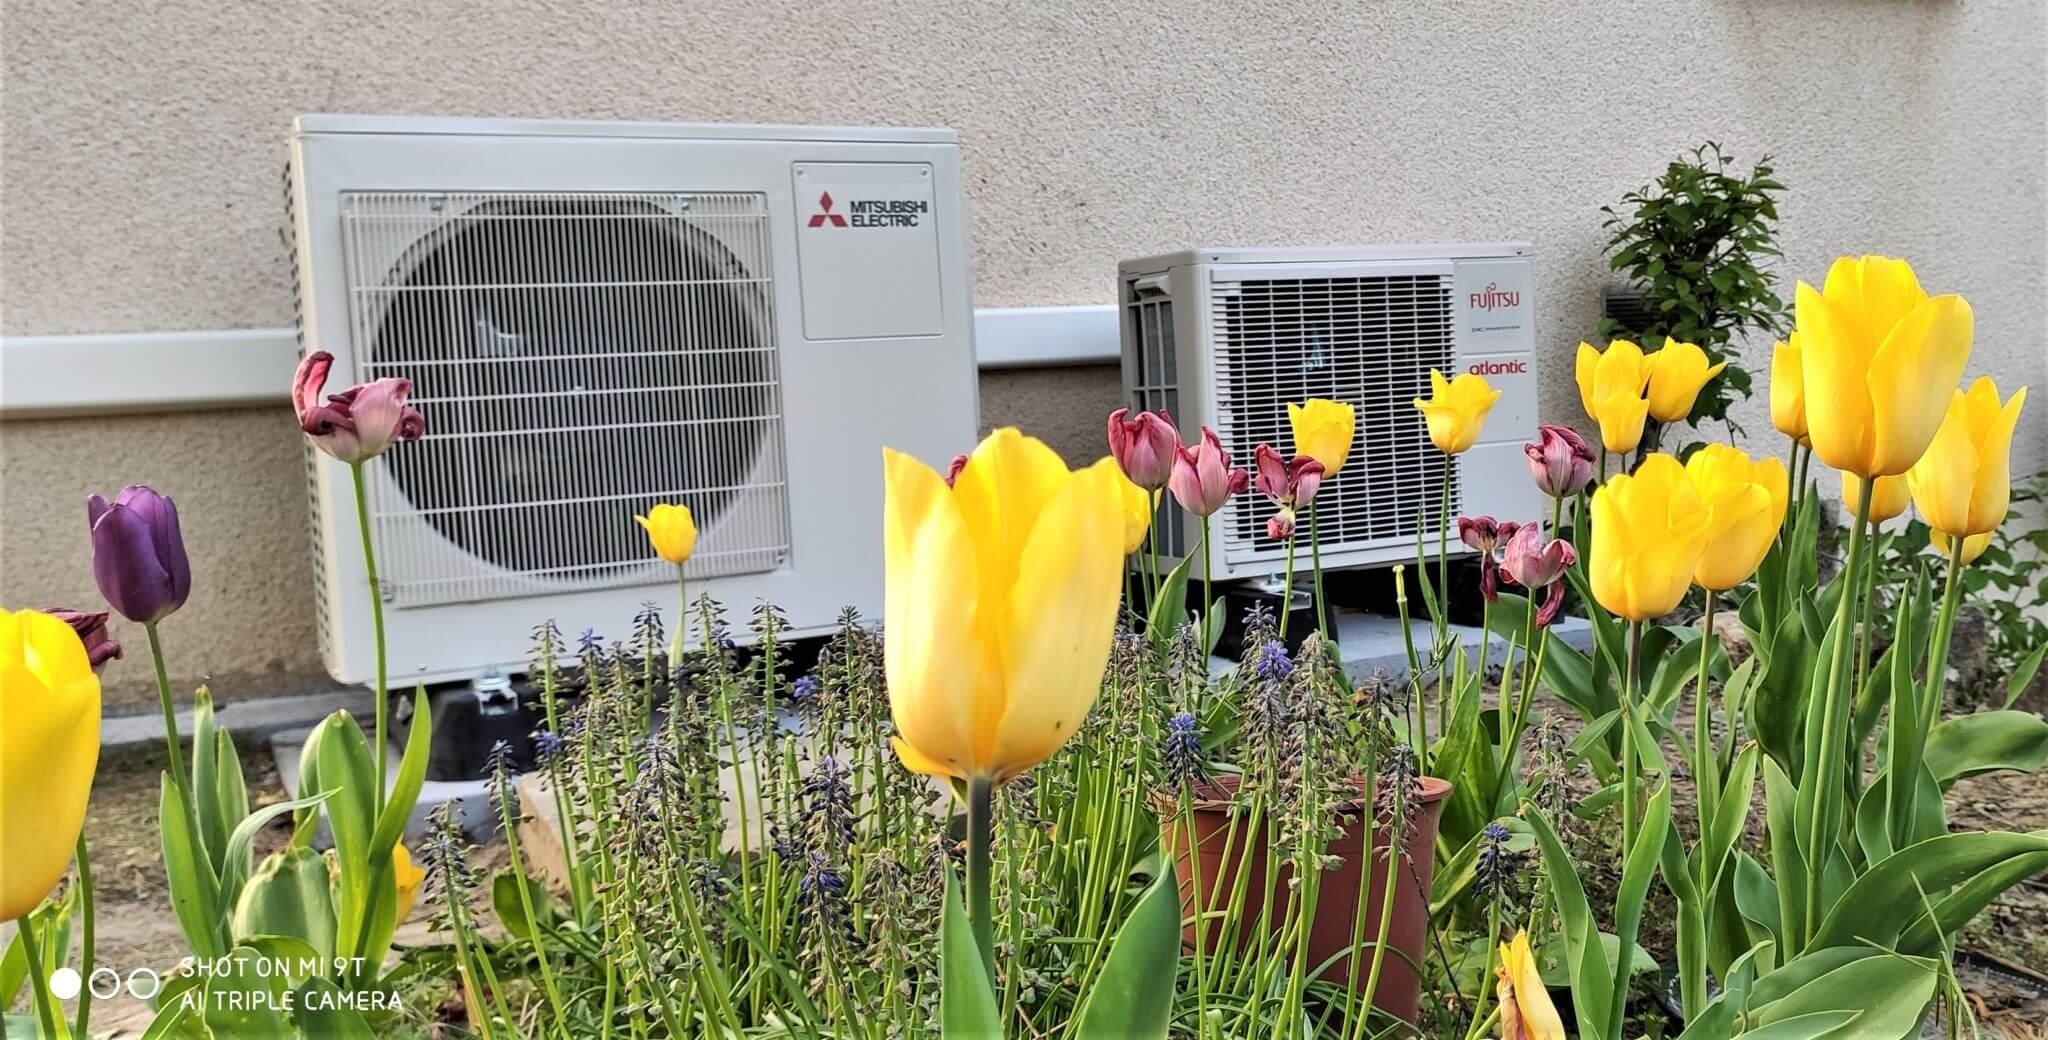 pompe a chaleur installation pompe à chaleur mitsubishi, ballon thermodynamique Atlantic, pac air air, clim